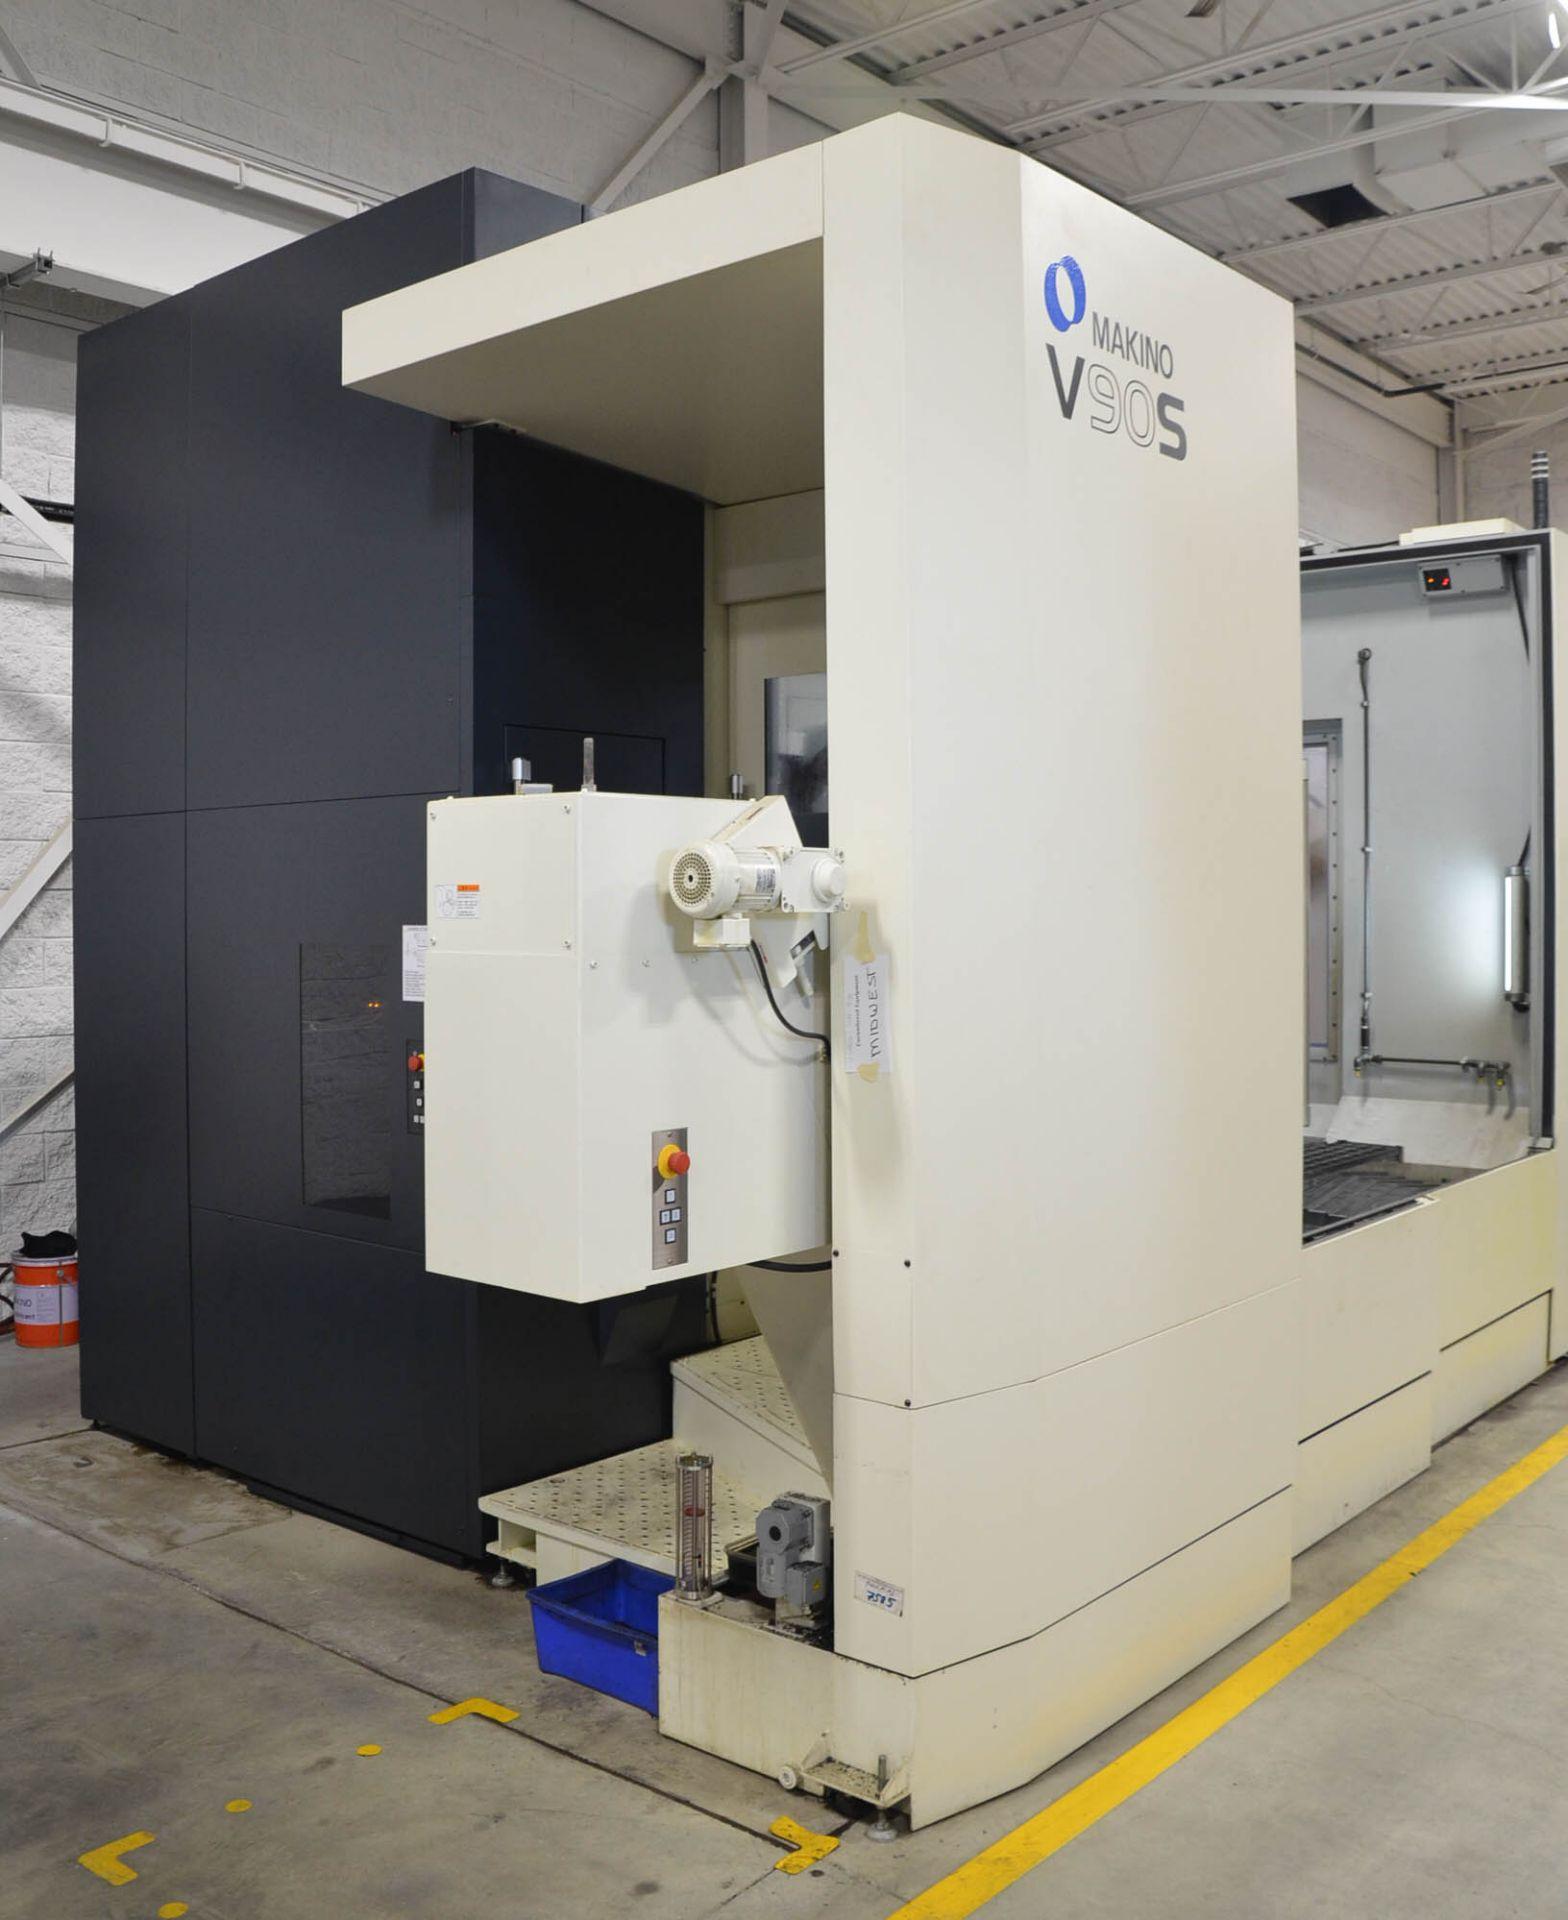 "MAKINO (NOV 2018) V90S 5-AXIS CNC MACHINING CENTER WITH MAKINO PROFESSIONAL 6 CNC CONTROL, 78.74"" - Image 5 of 15"